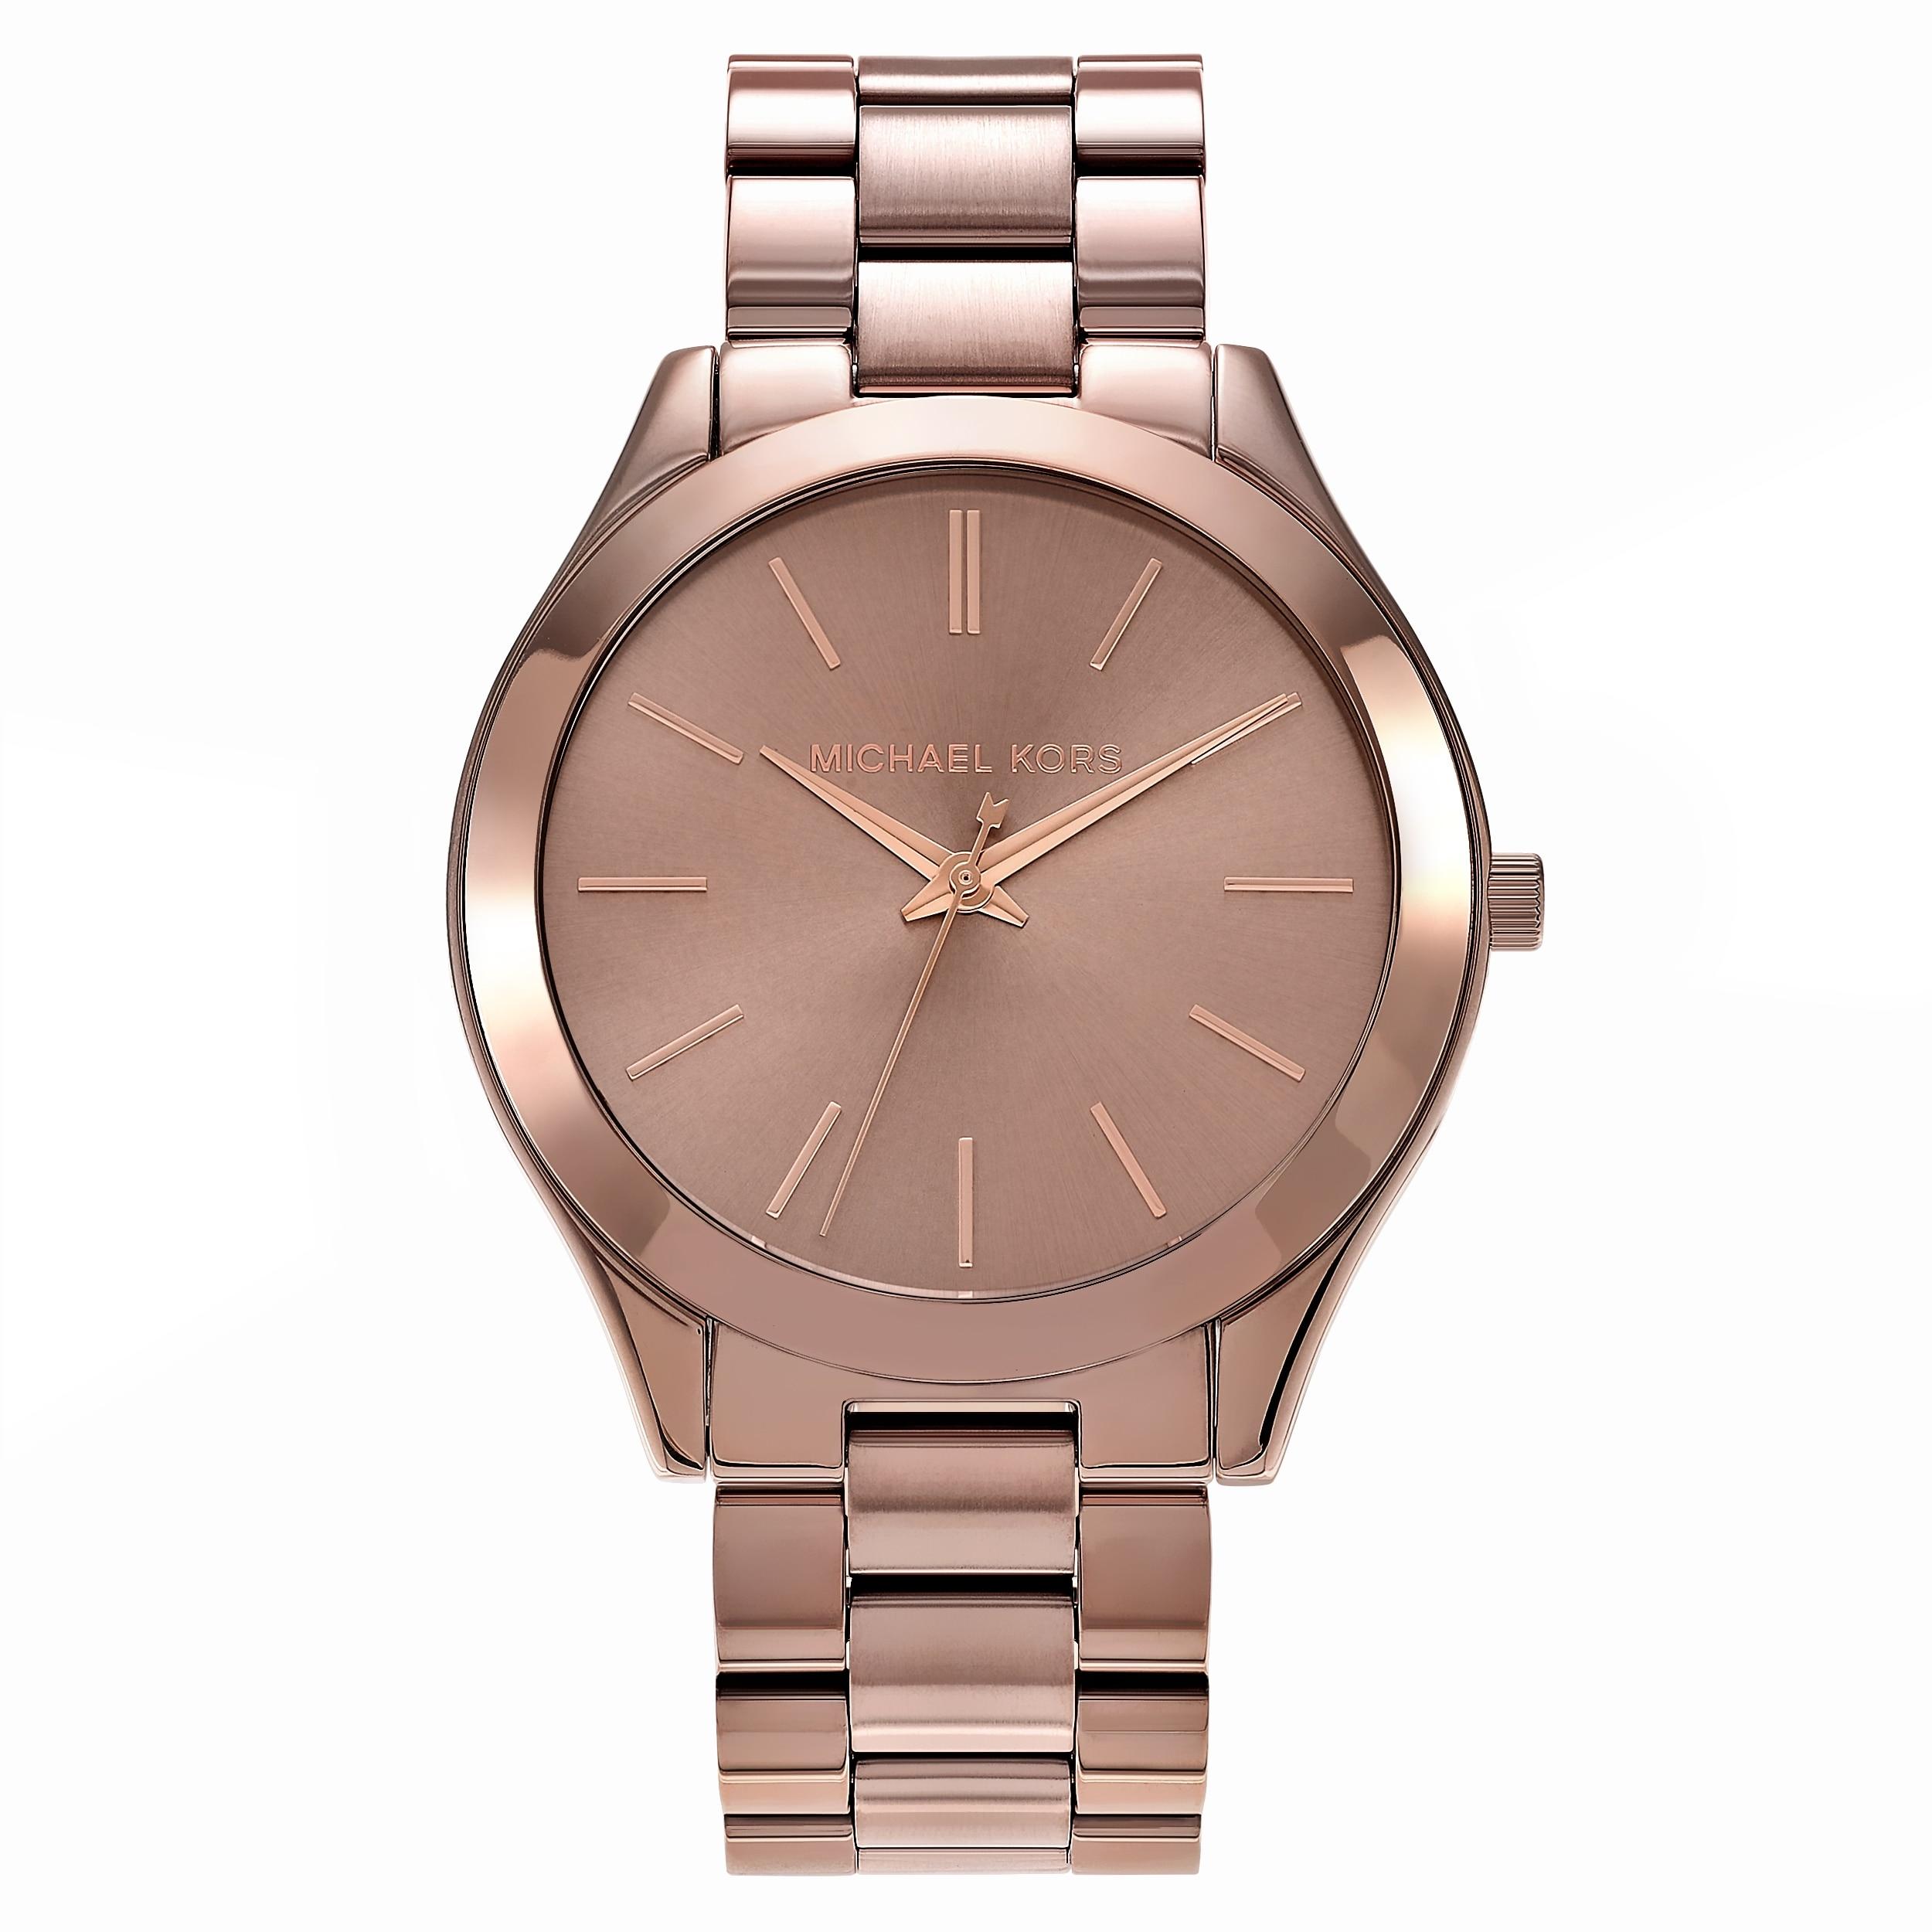 404af7124a370 Michael Kors Women's 'Runway' MK3418 Stainless Steel Sable Dial Bracelet  Watch